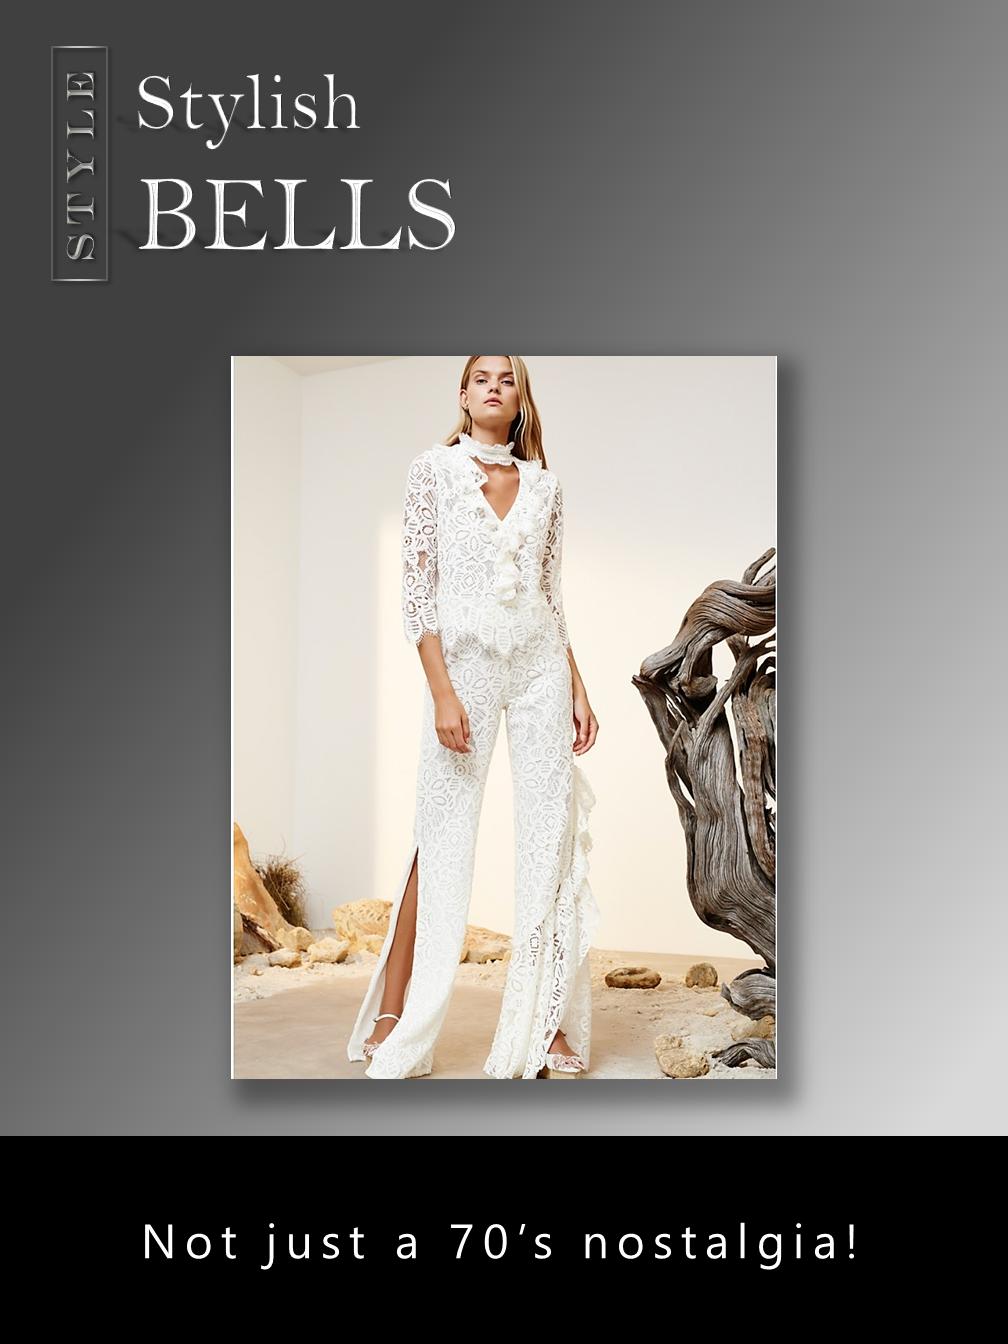 Stylish Bells